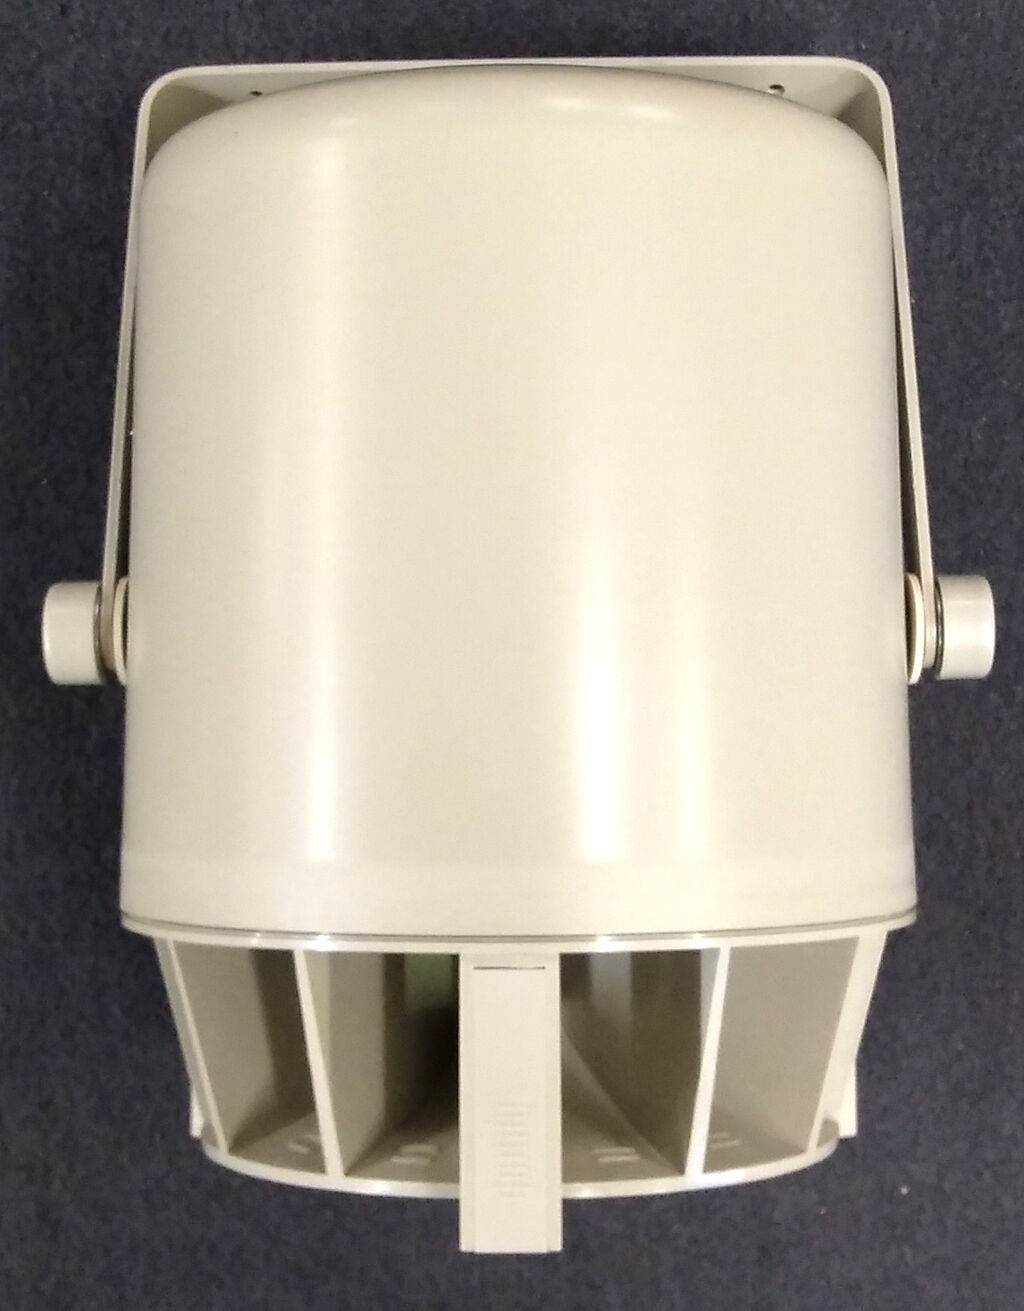 Audio-Technica AL60 Omnidirectional Outside Loudspeaker